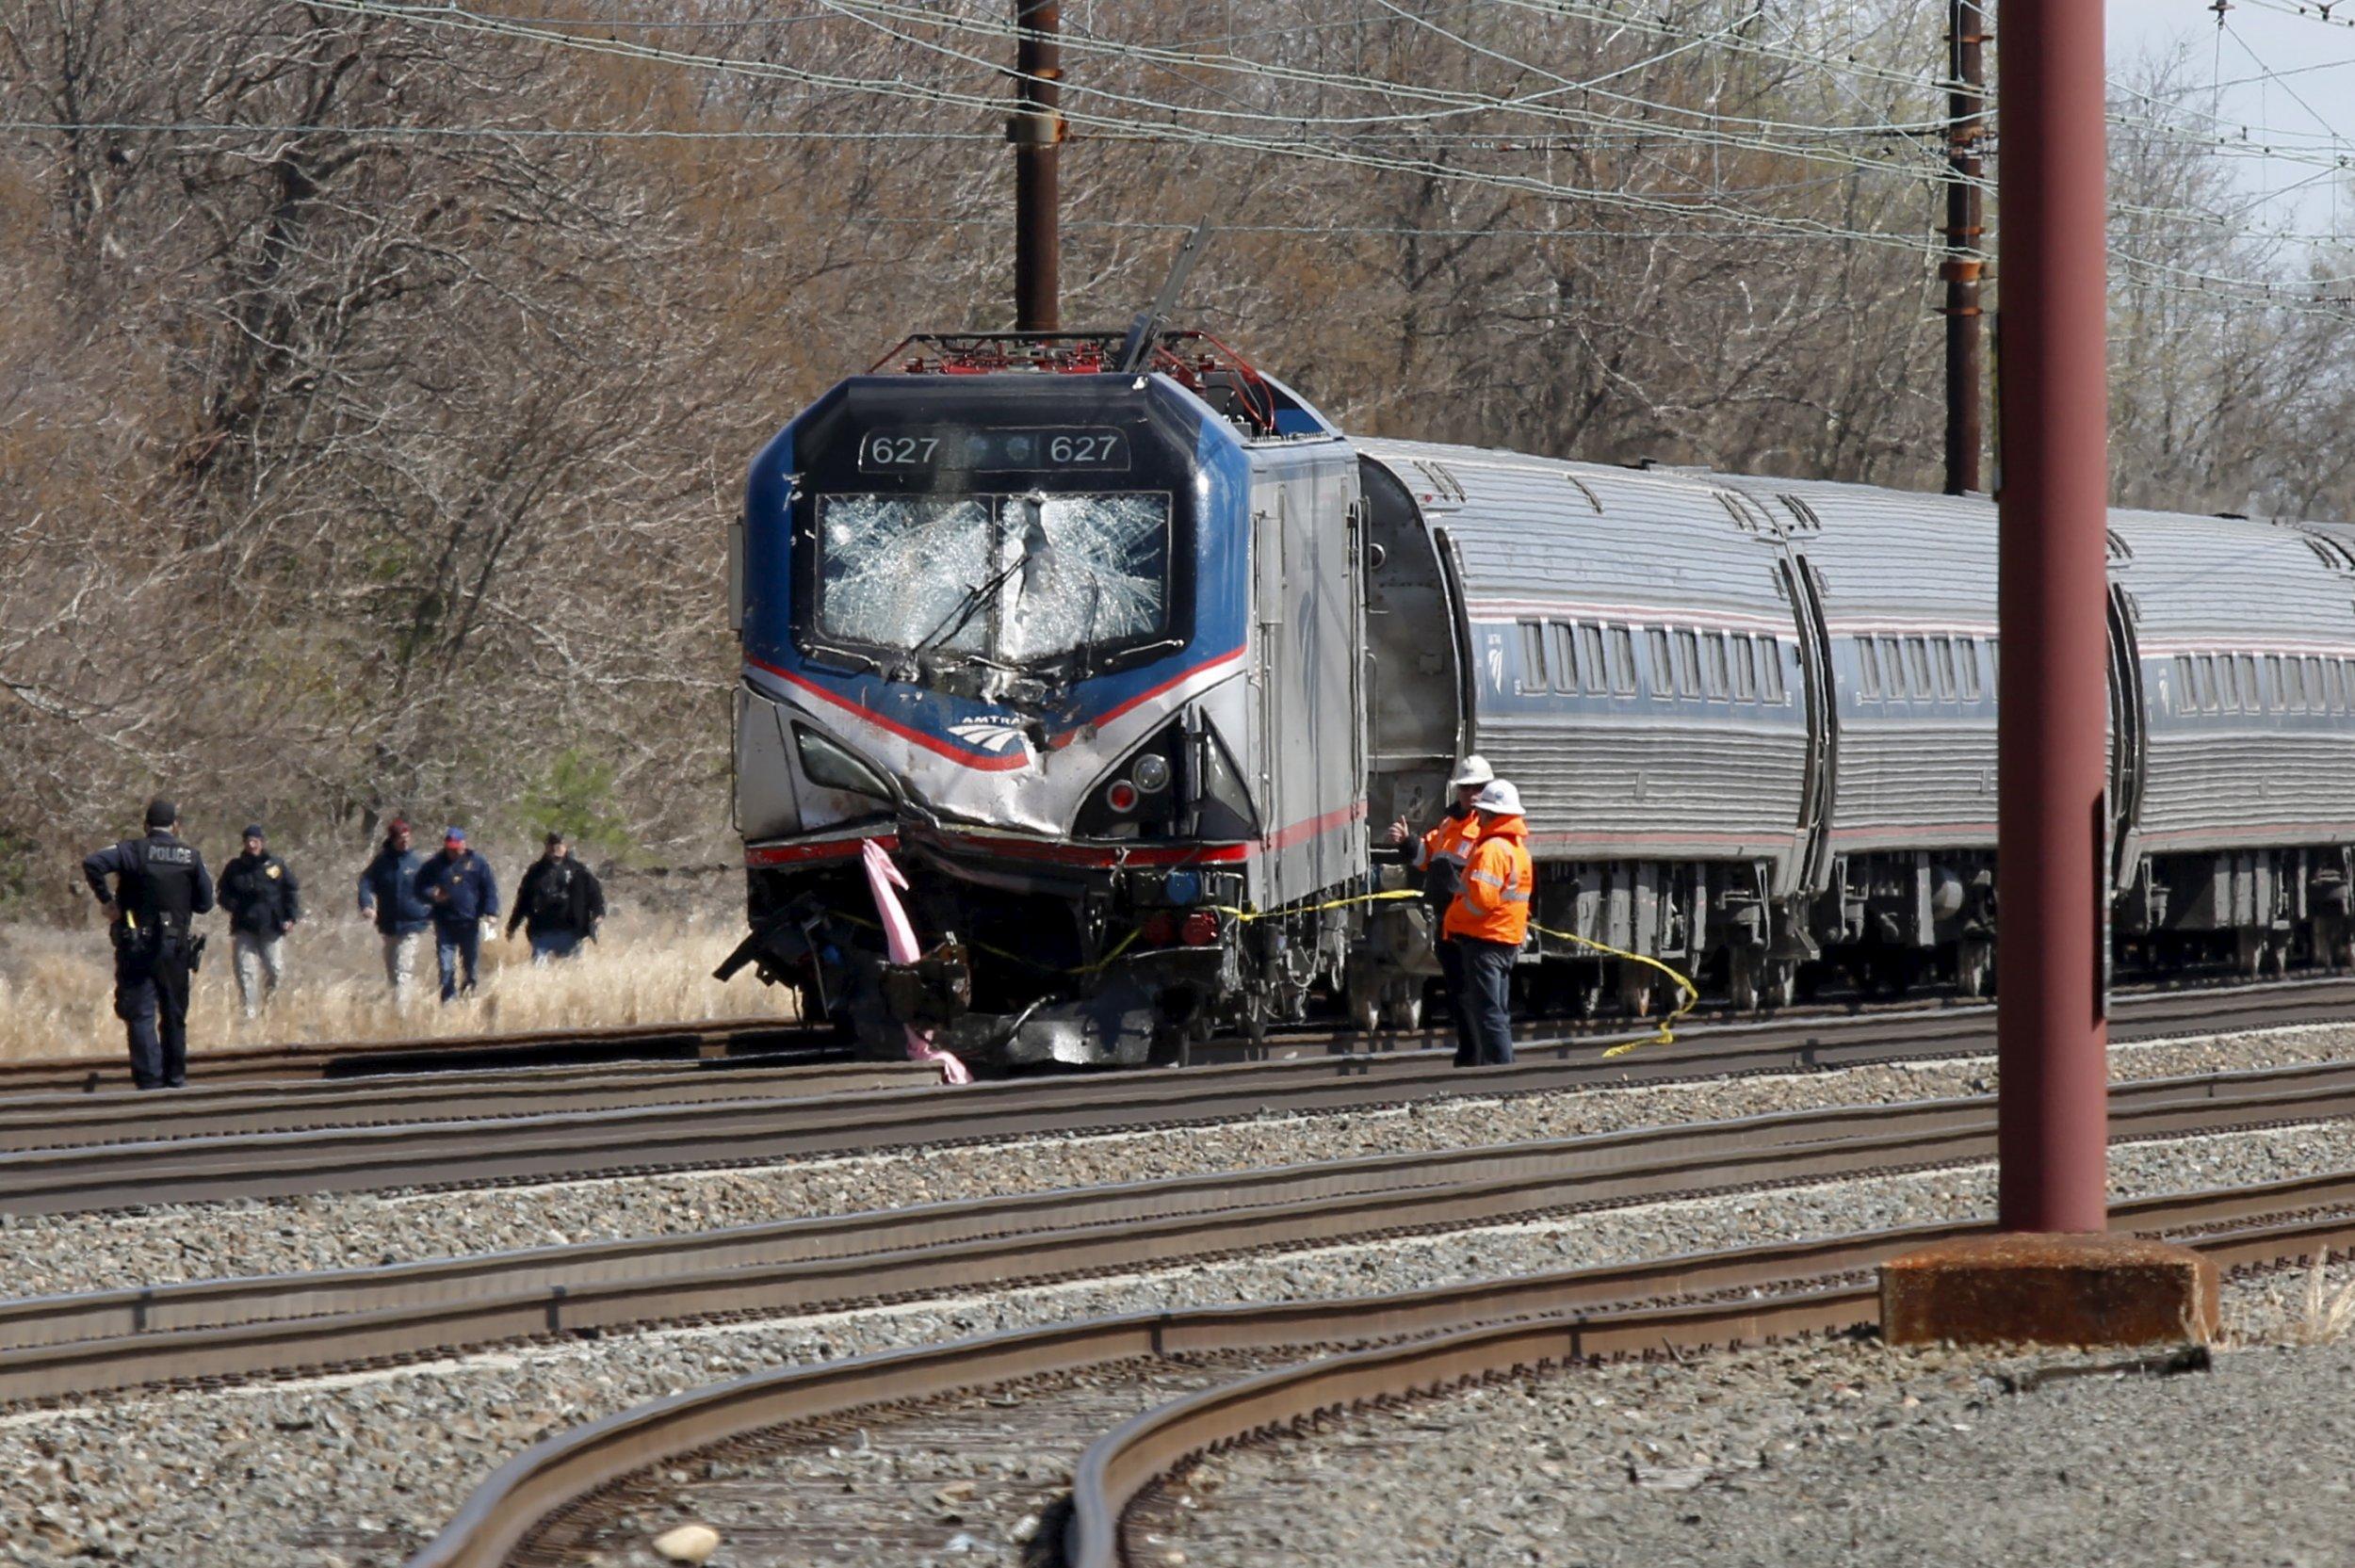 Amtrak Derailment: Photos From Deadly Washington Train Crash